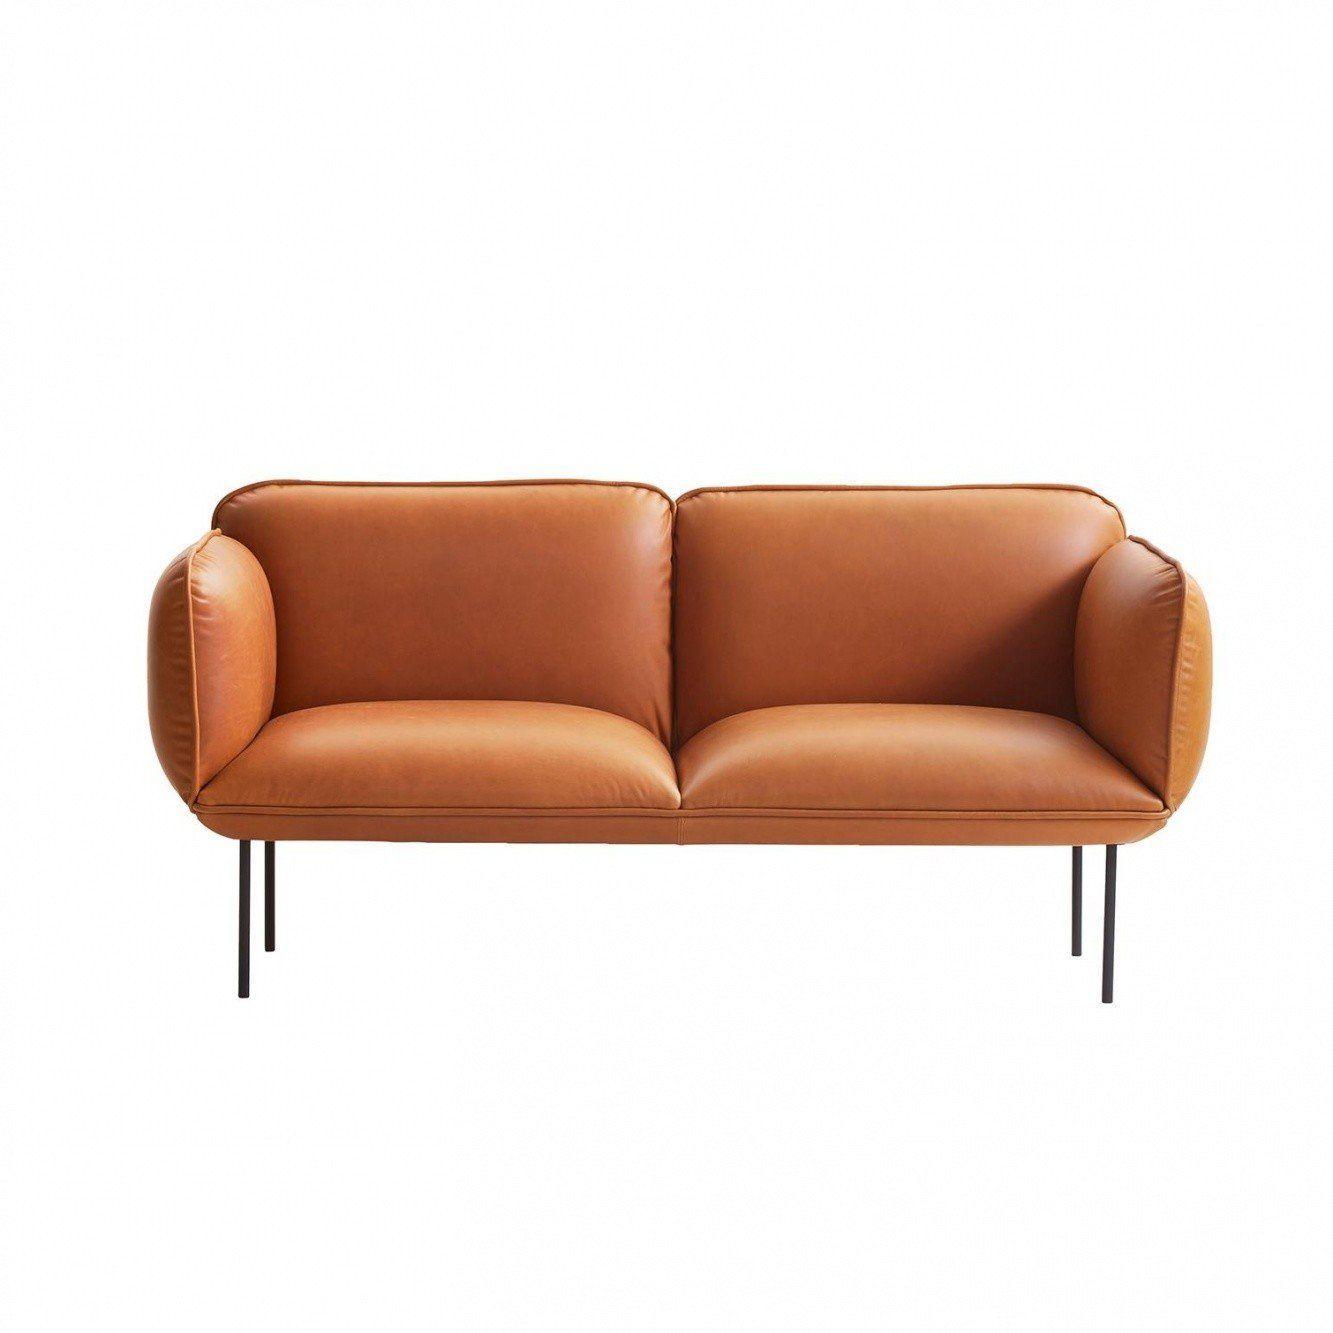 Beau Woud   Nakki 2 Seater Leather Sofa   Light ...